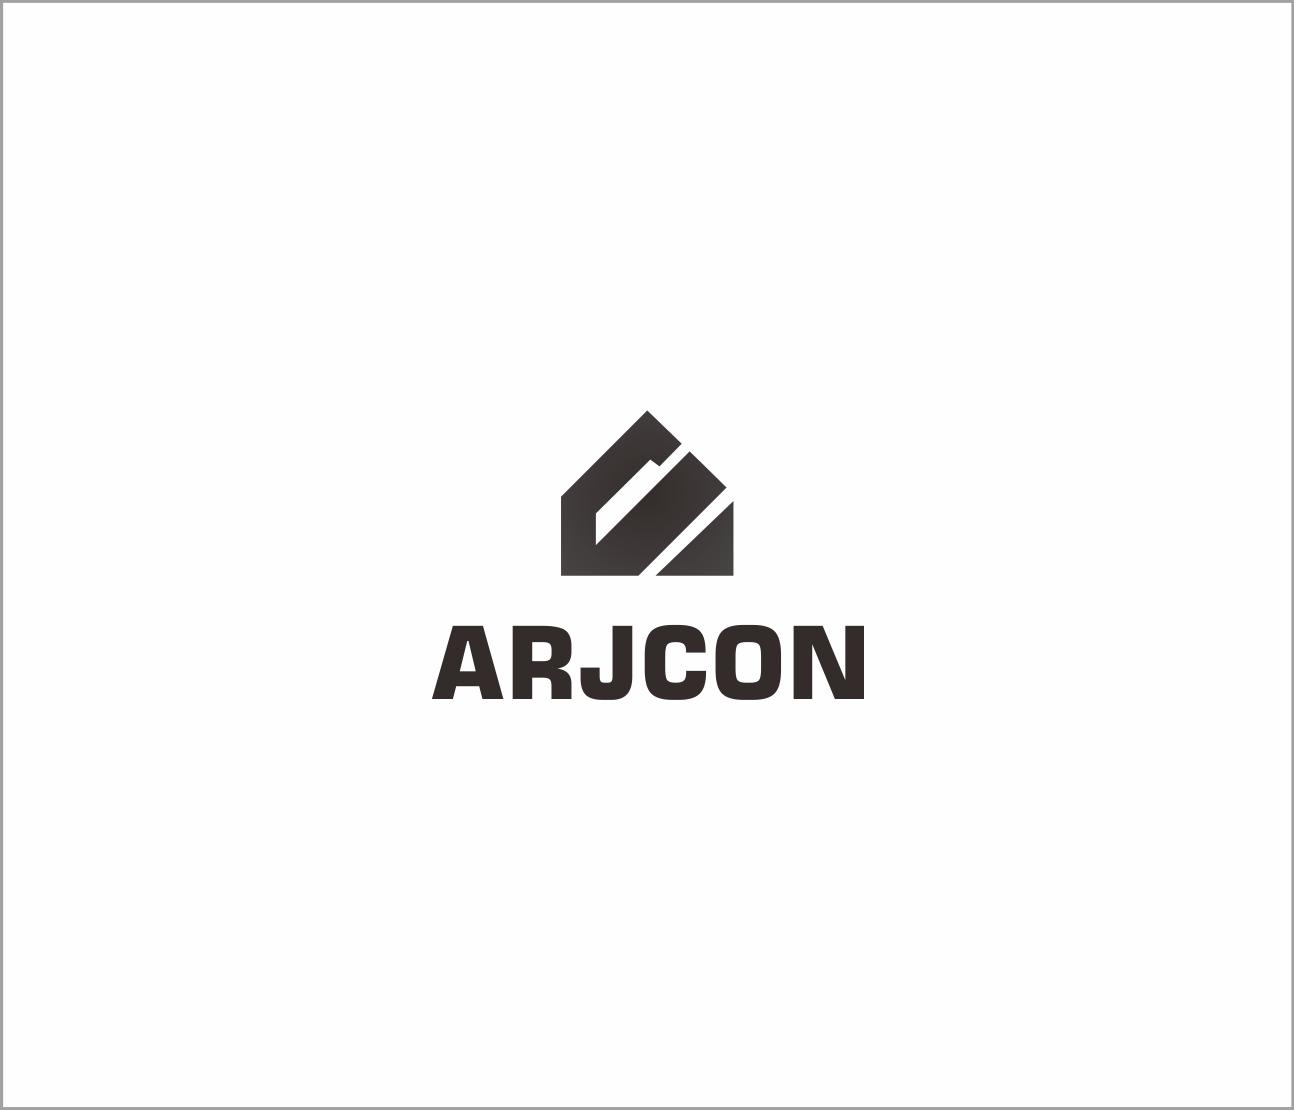 Logo Design by Armada Jamaluddin - Entry No. 37 in the Logo Design Contest Inspiring Logo Design for ARJCON.